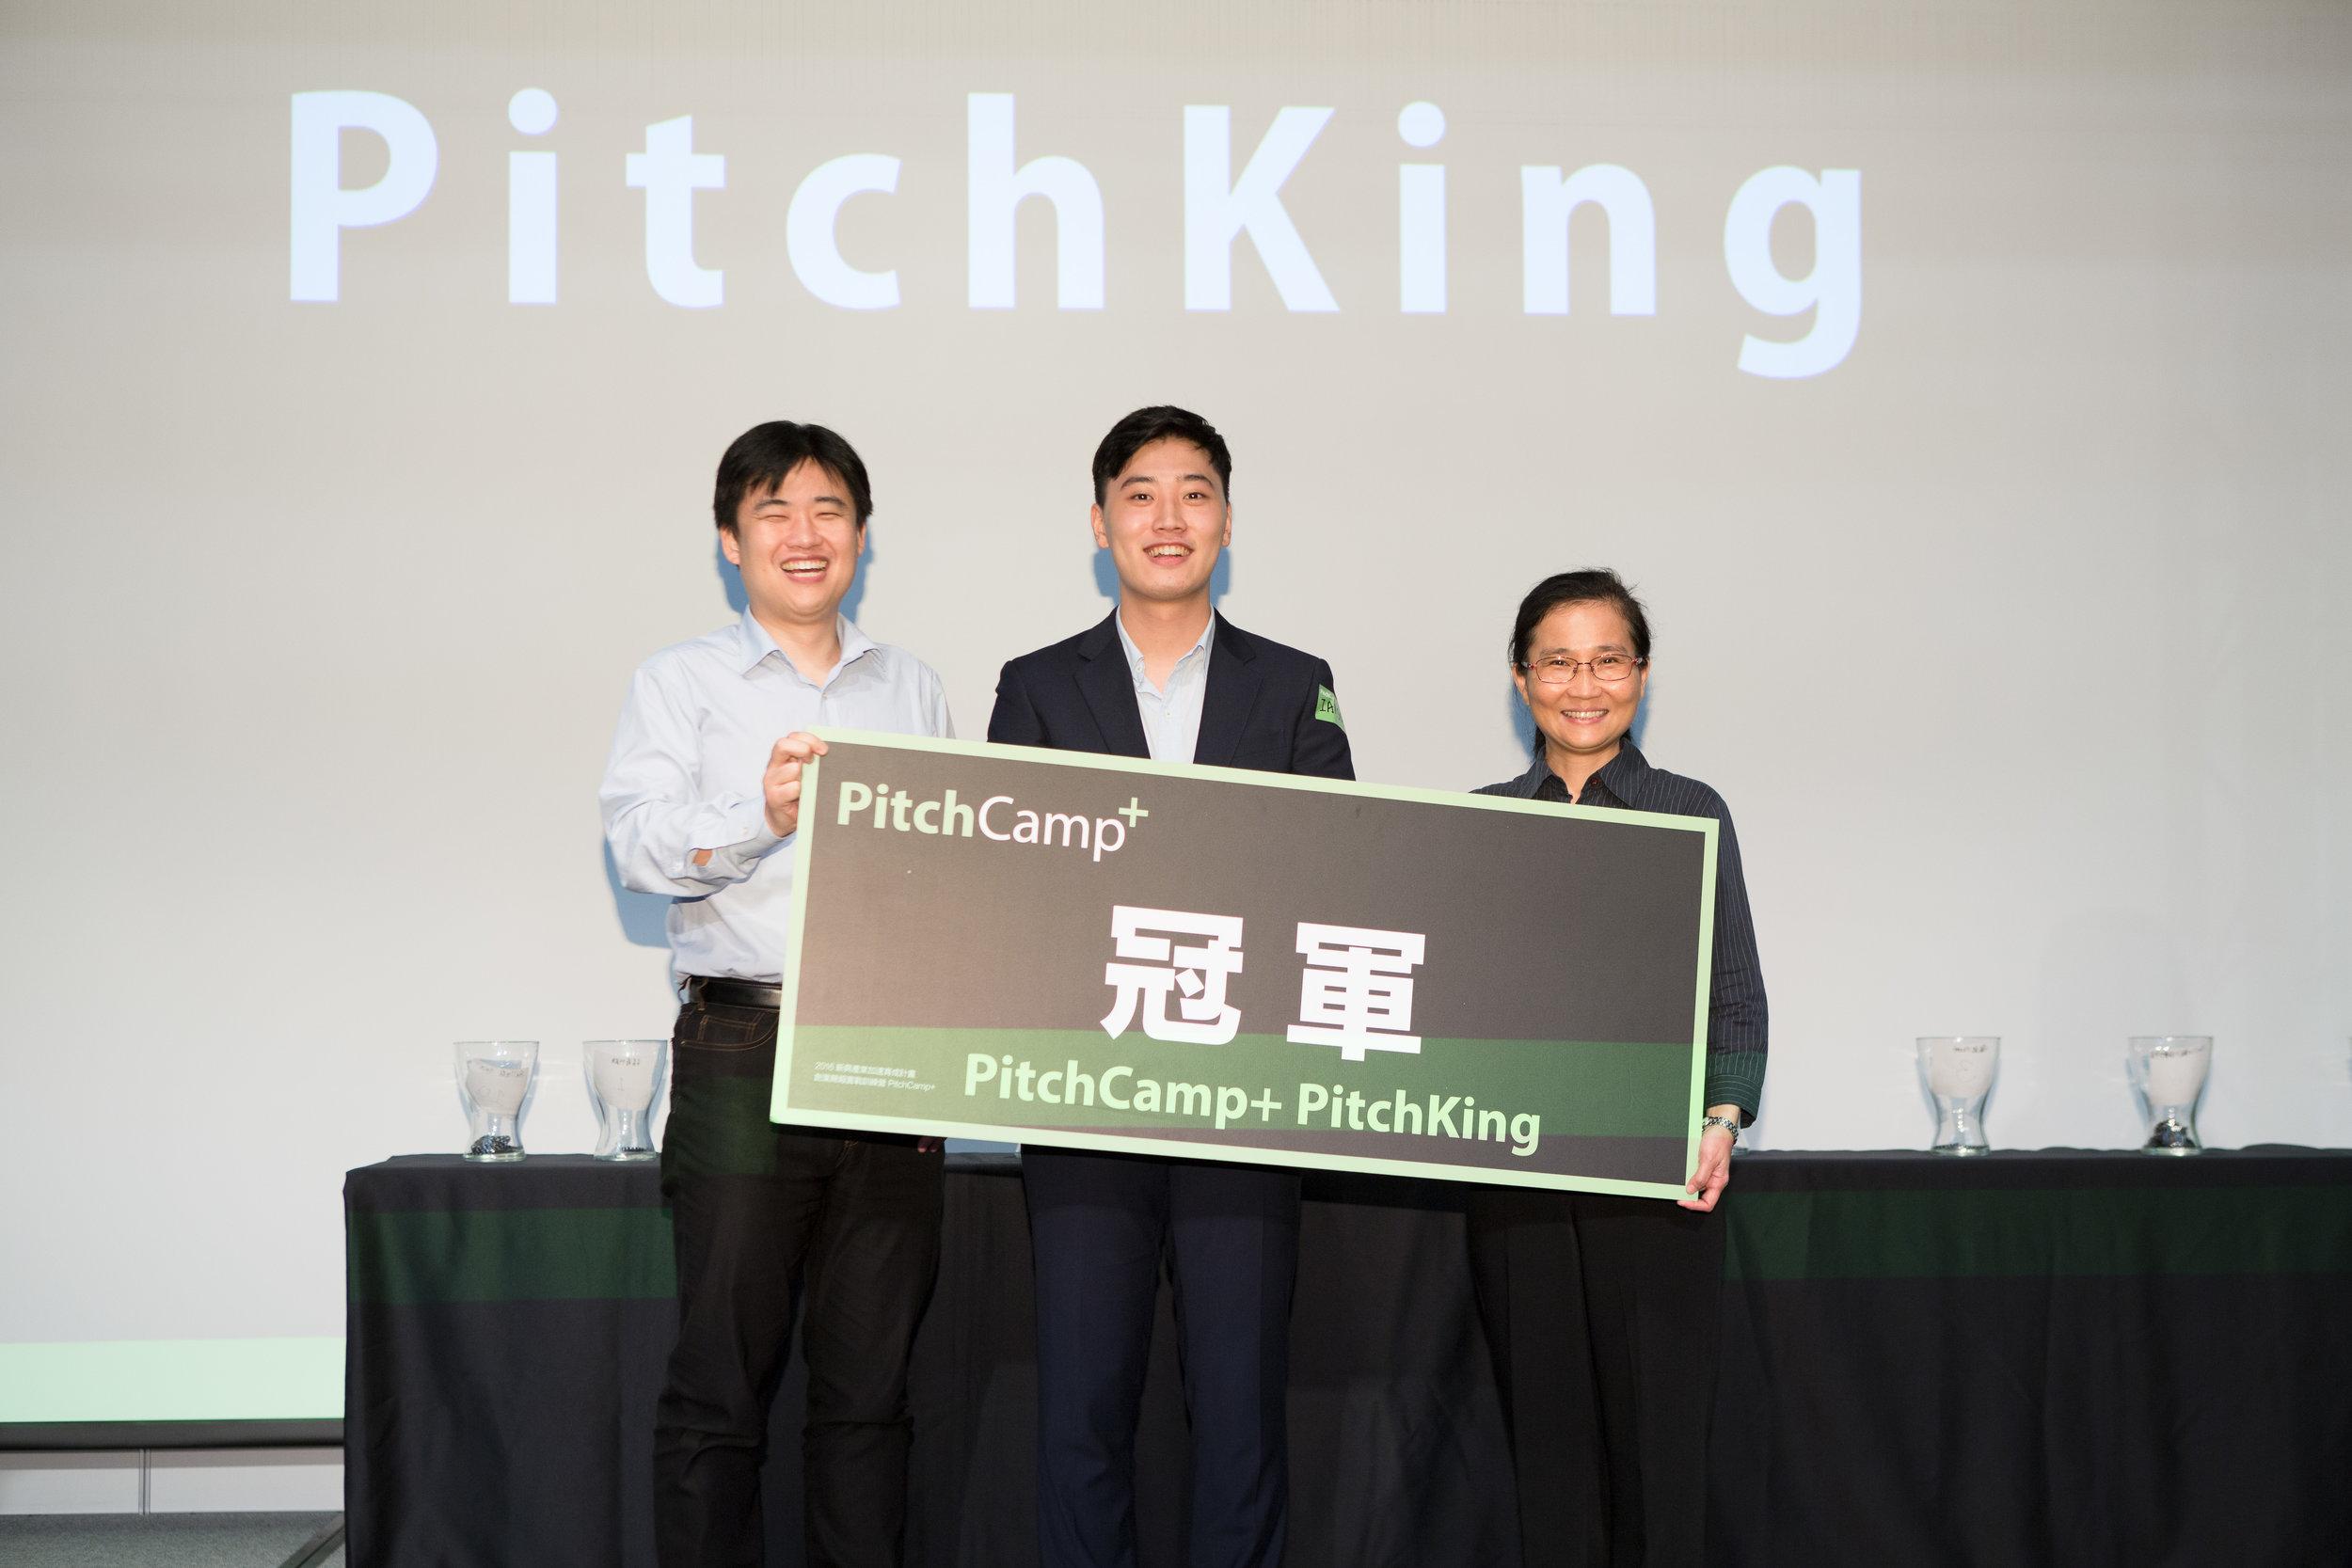 PitchCamp+